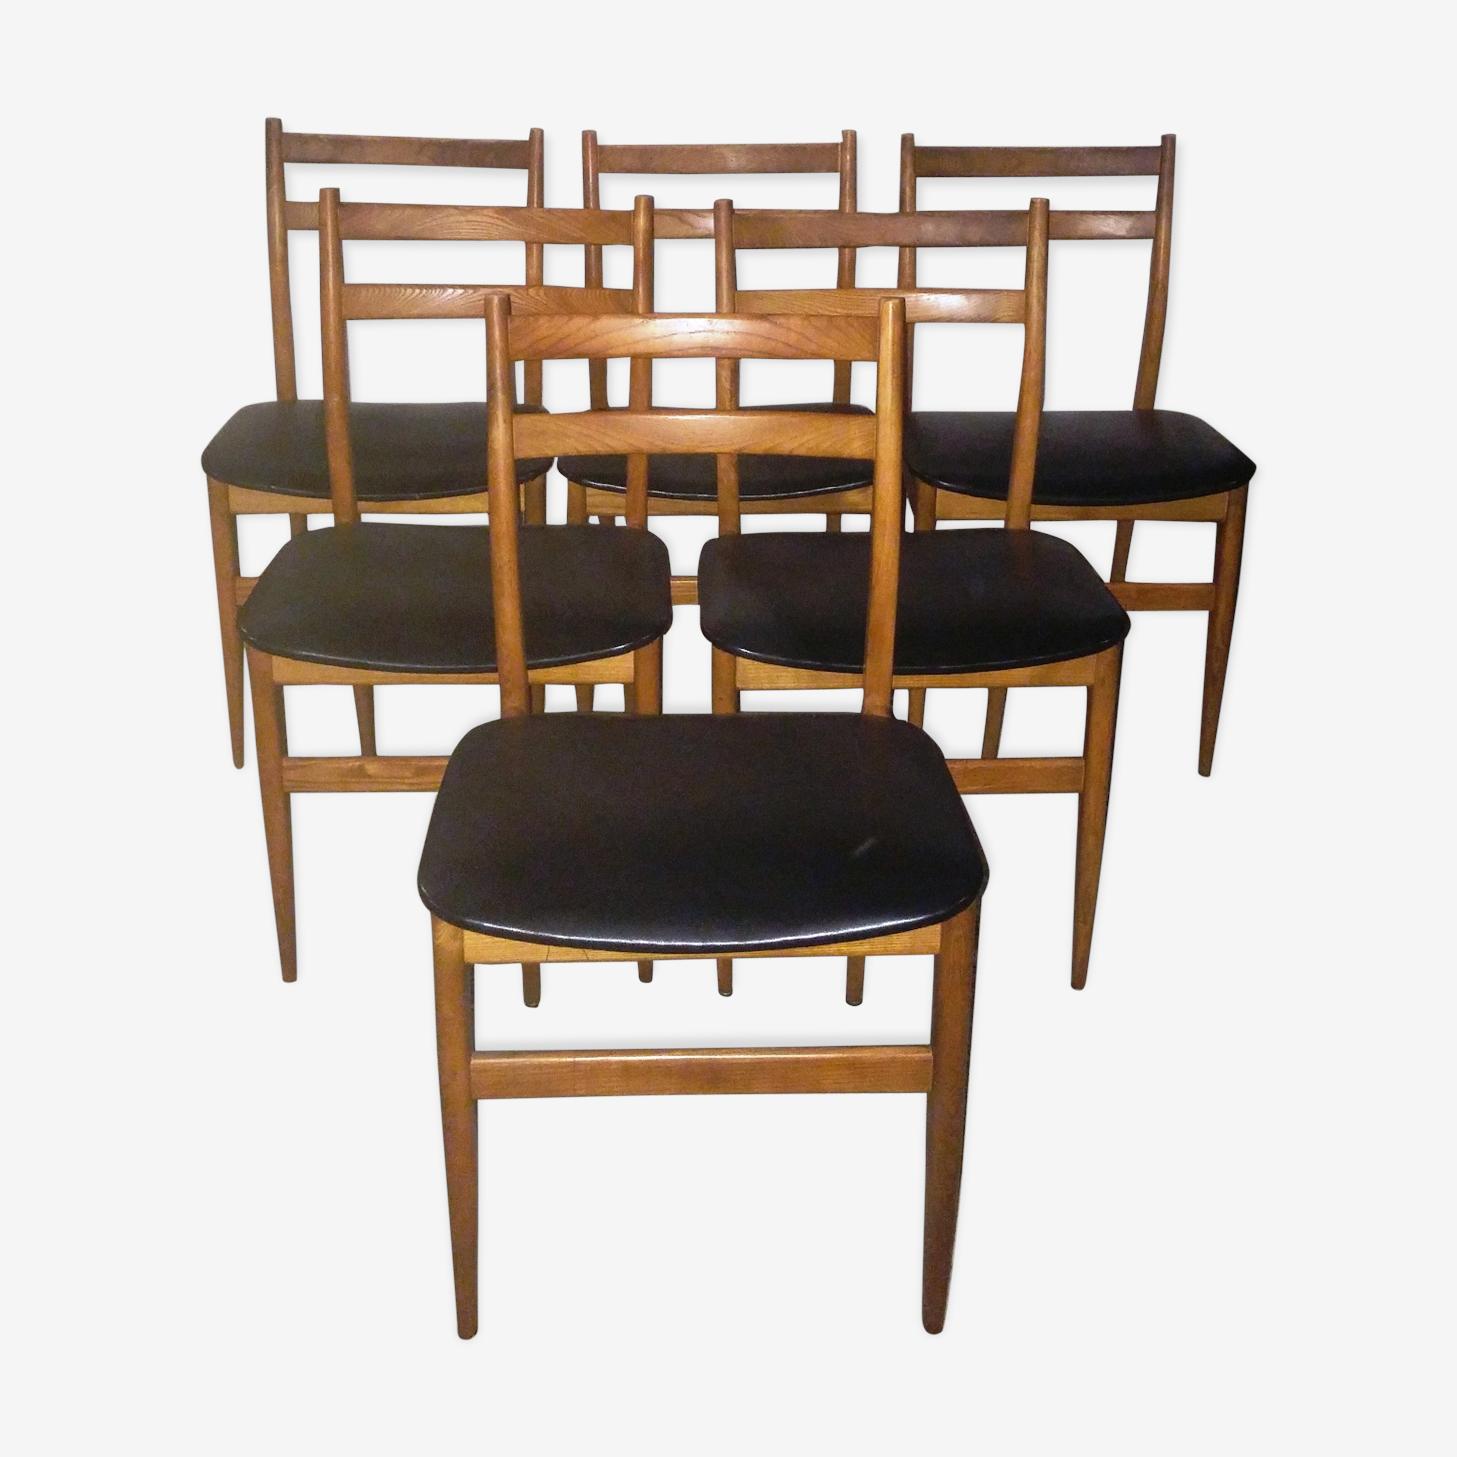 6 scandinavian chairs